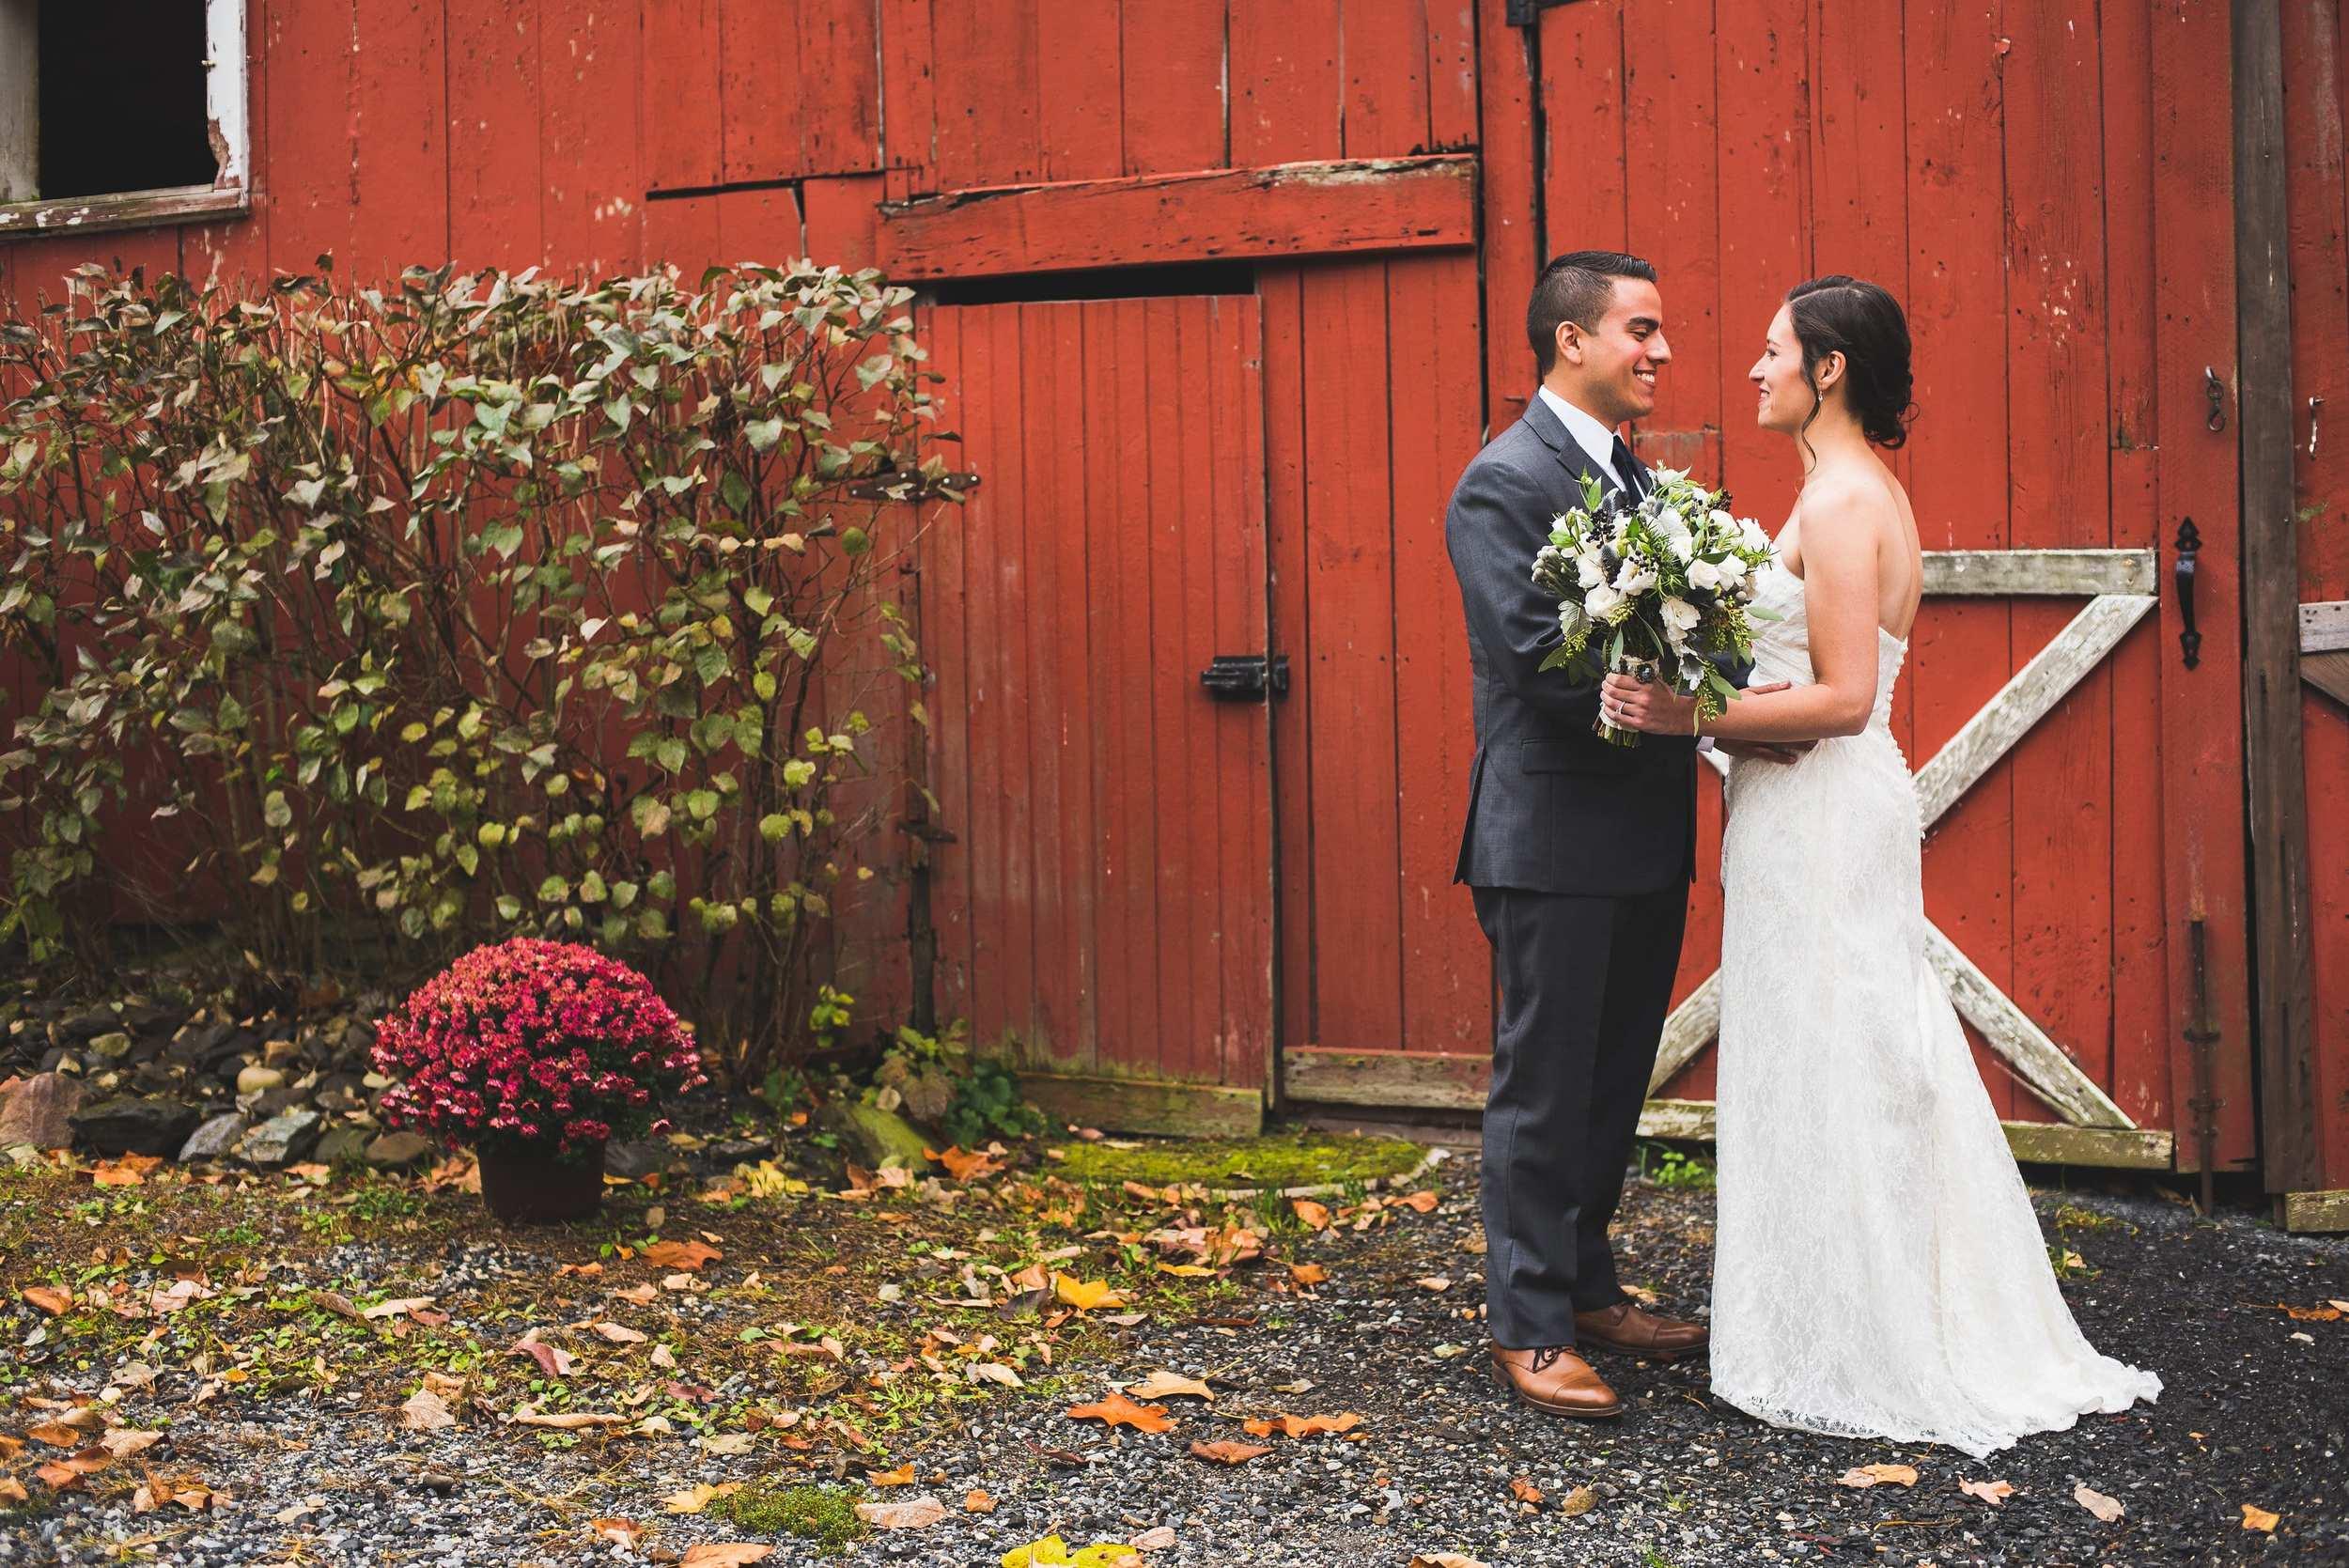 New-York-Wedding-Photographer-Falkirk-Wedding(55of163)-min.jpg